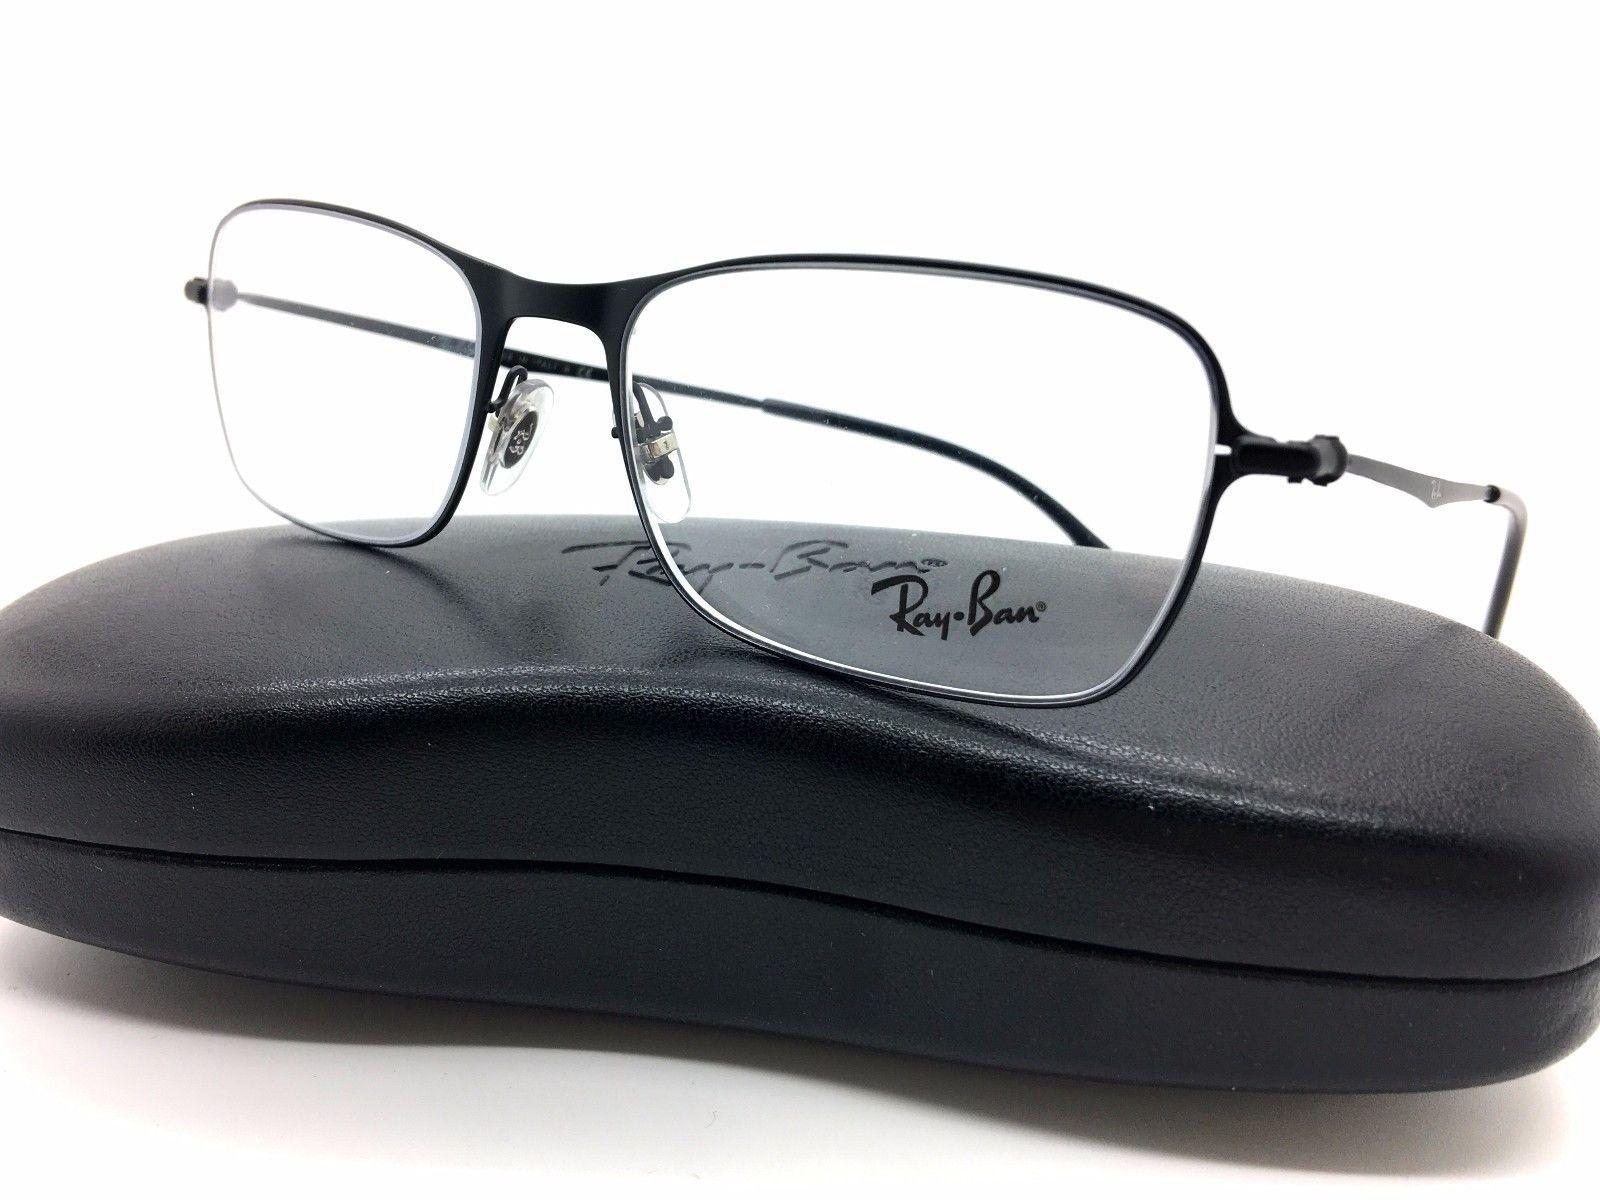 e2359b48c1 S l1600. S l1600. Ray Ban Matte Black Metal RB 6253 2760 54mm 18mm 145  Eyeglasses Demo lenses. Free Shipping